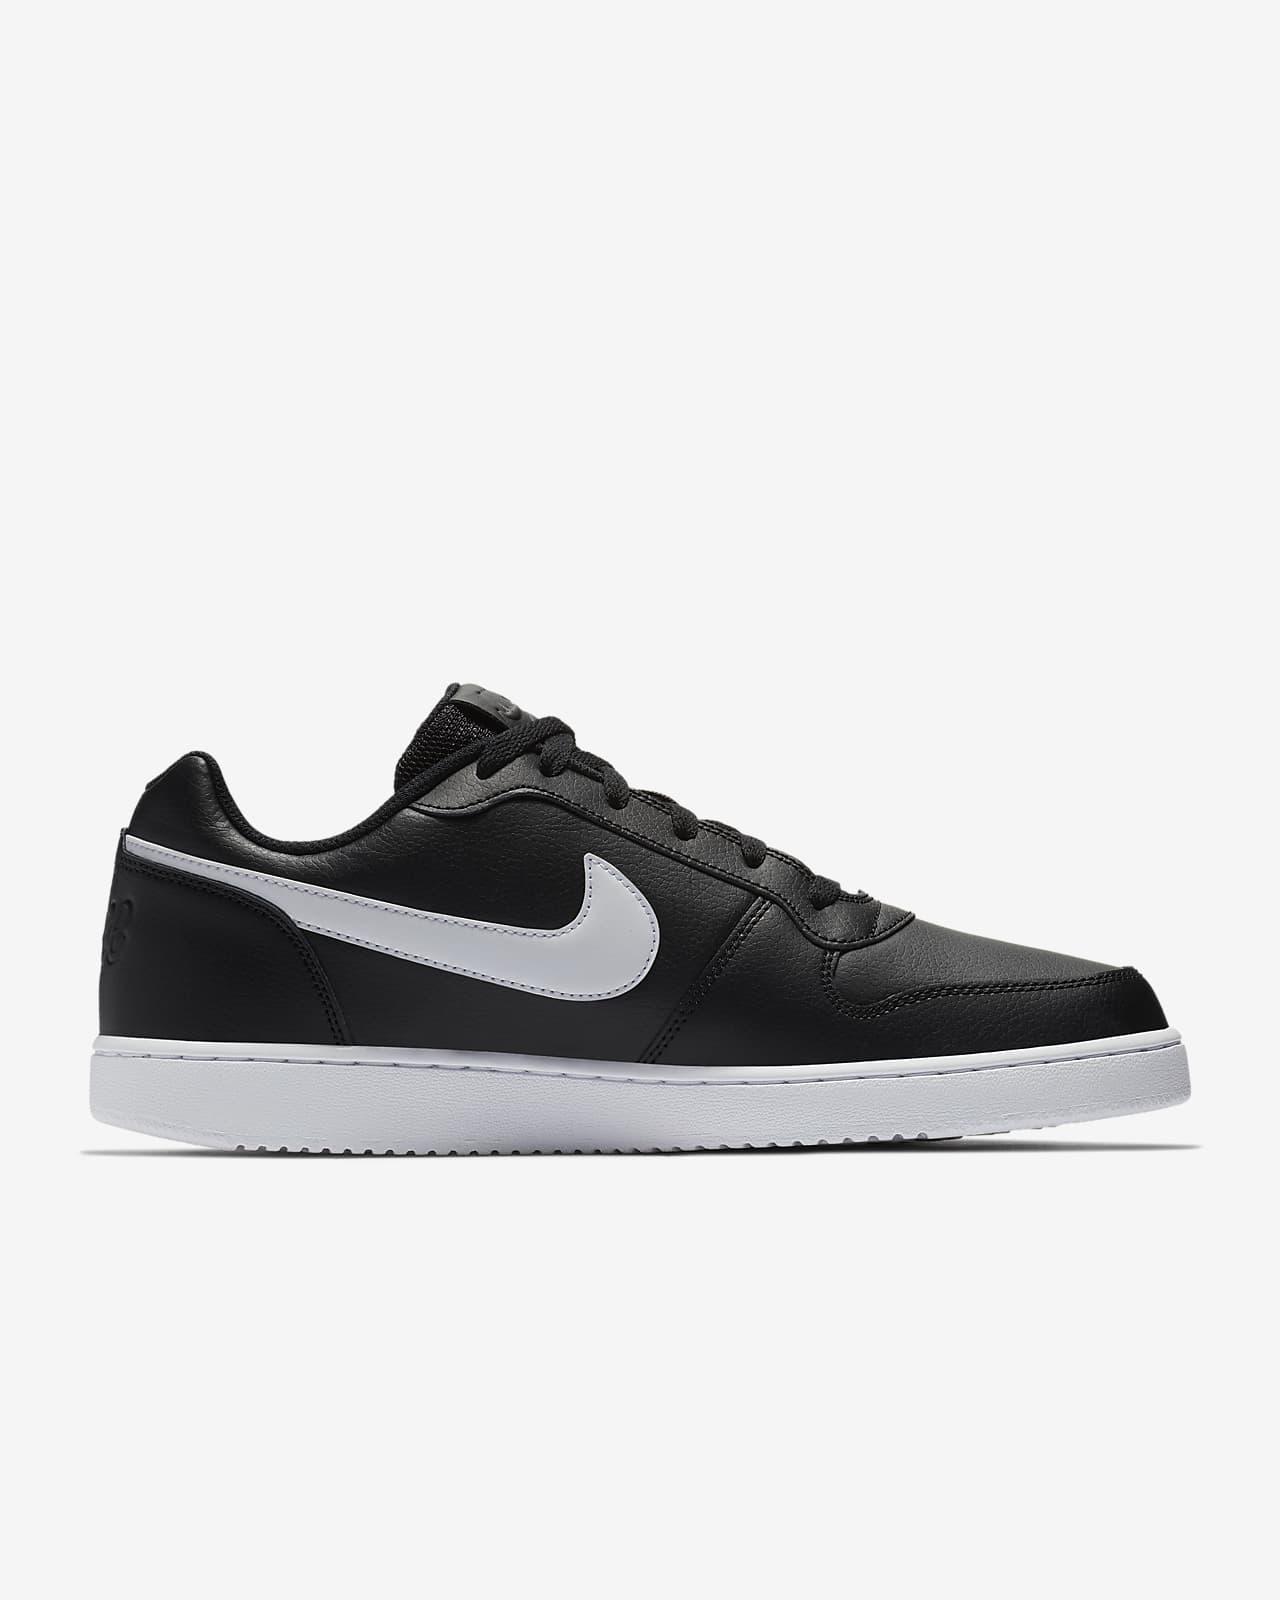 Nike Ebernon Low Men's Shoe. Nike AE